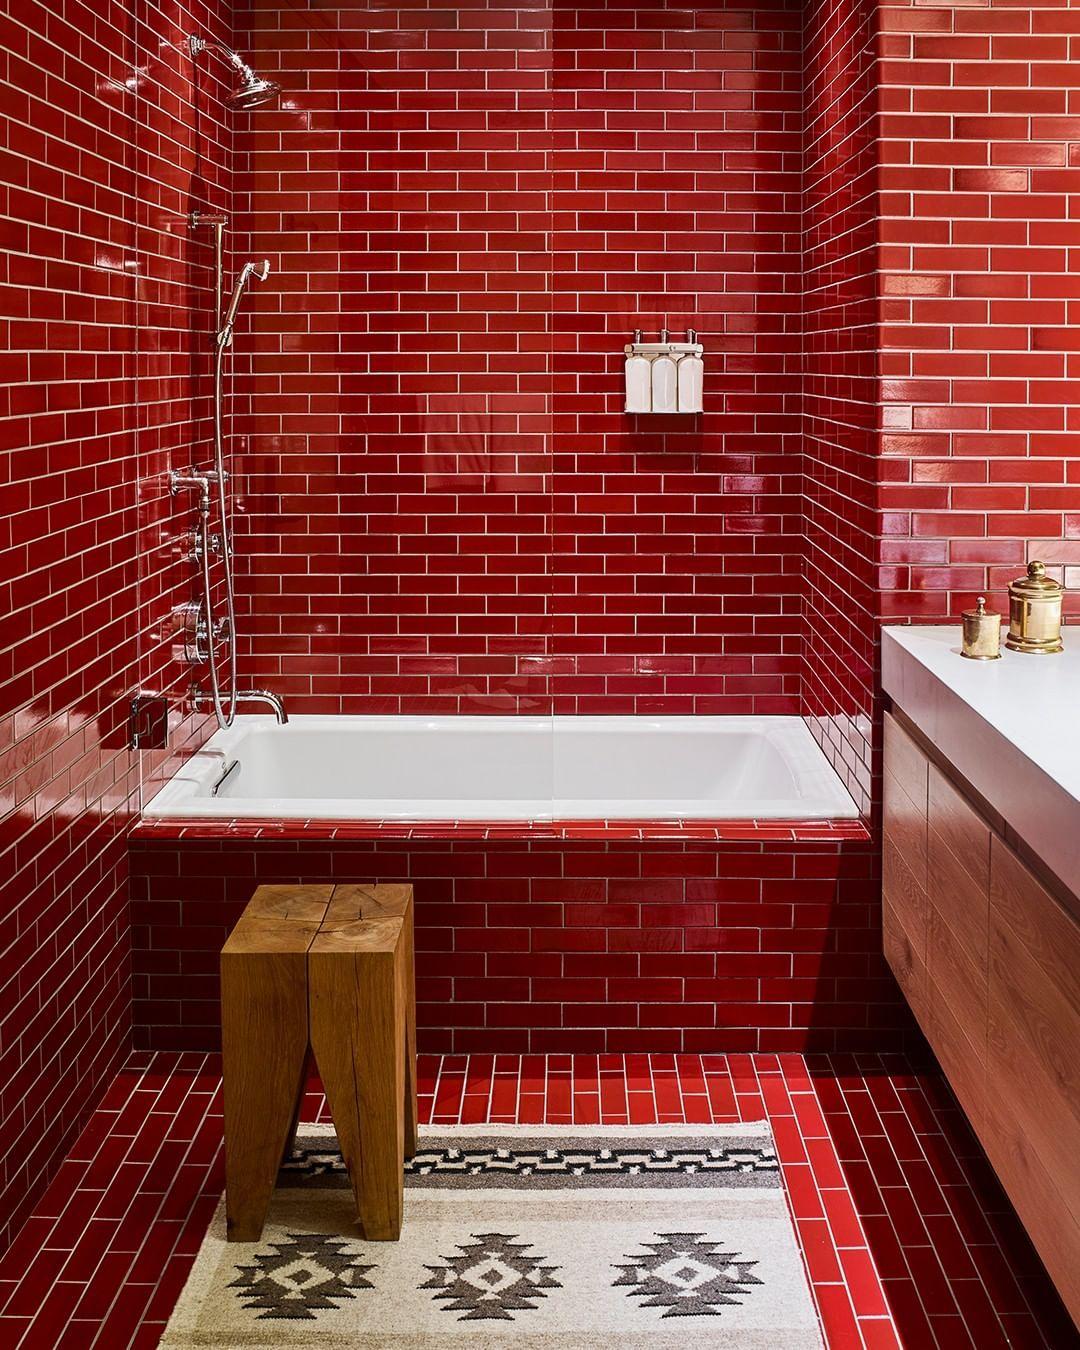 Image May Contain Indoor Bathroom Red Red Bathroom Decor Best Bathroom Tiles